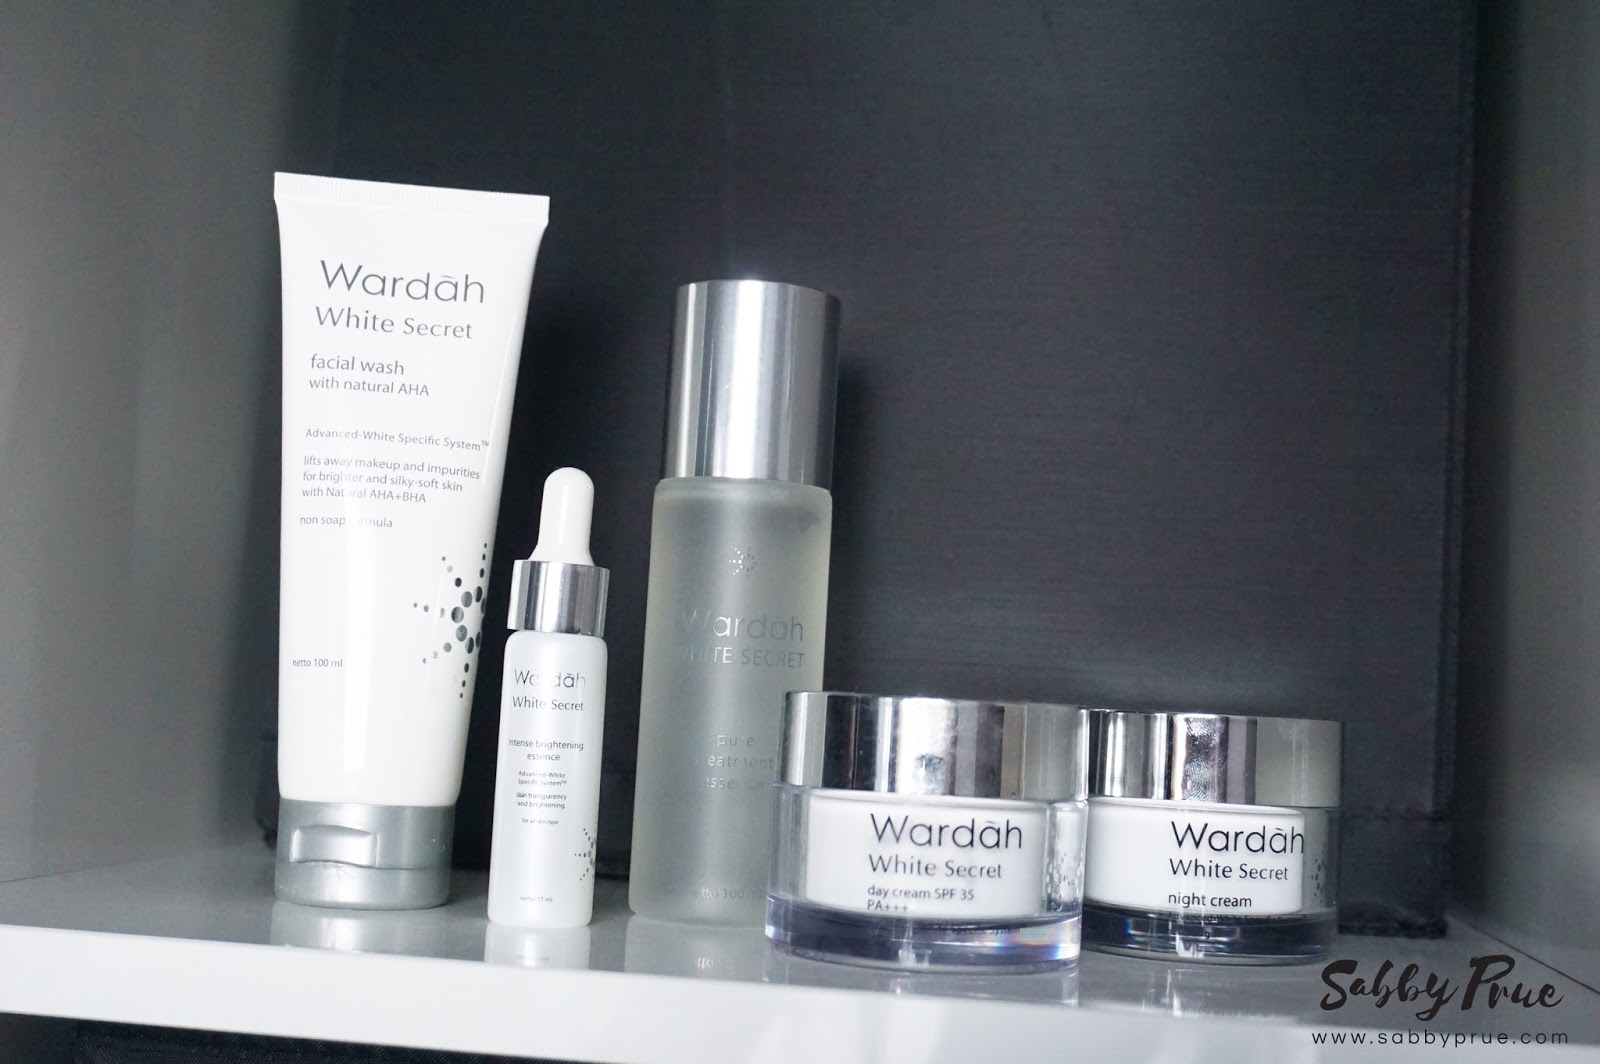 Review Wardah White Secret Night Cream Untuk Jerawat  Mujarab